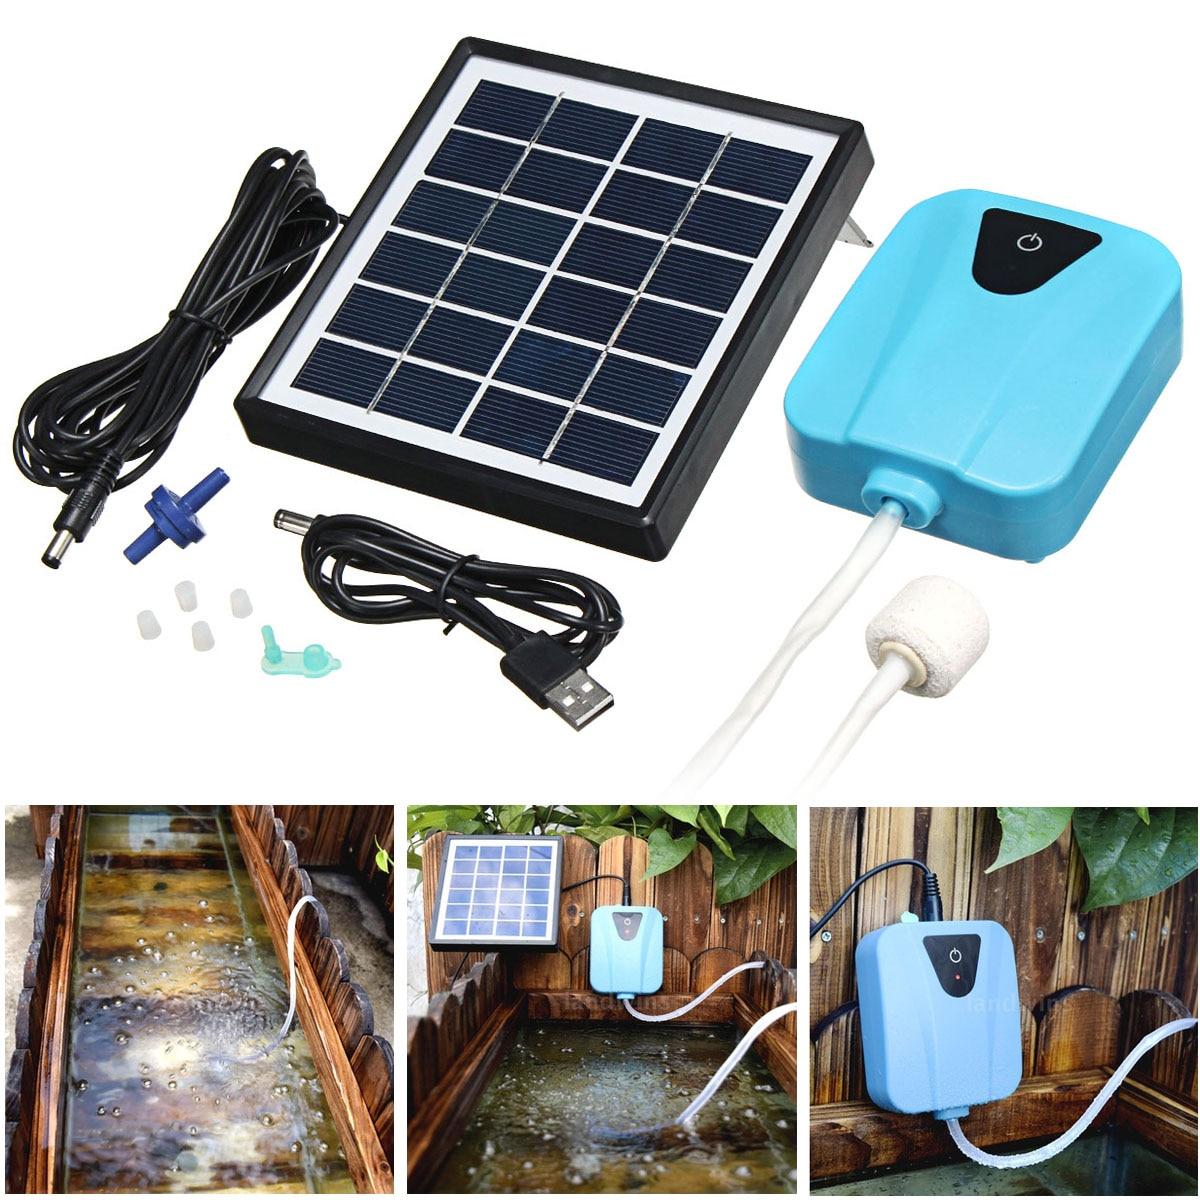 Silent Solar Powered Charging Water Oxygenator Mini Air Pump Oxygen Air Compressor Aerator Garden Aquarium Plant Fish Tank